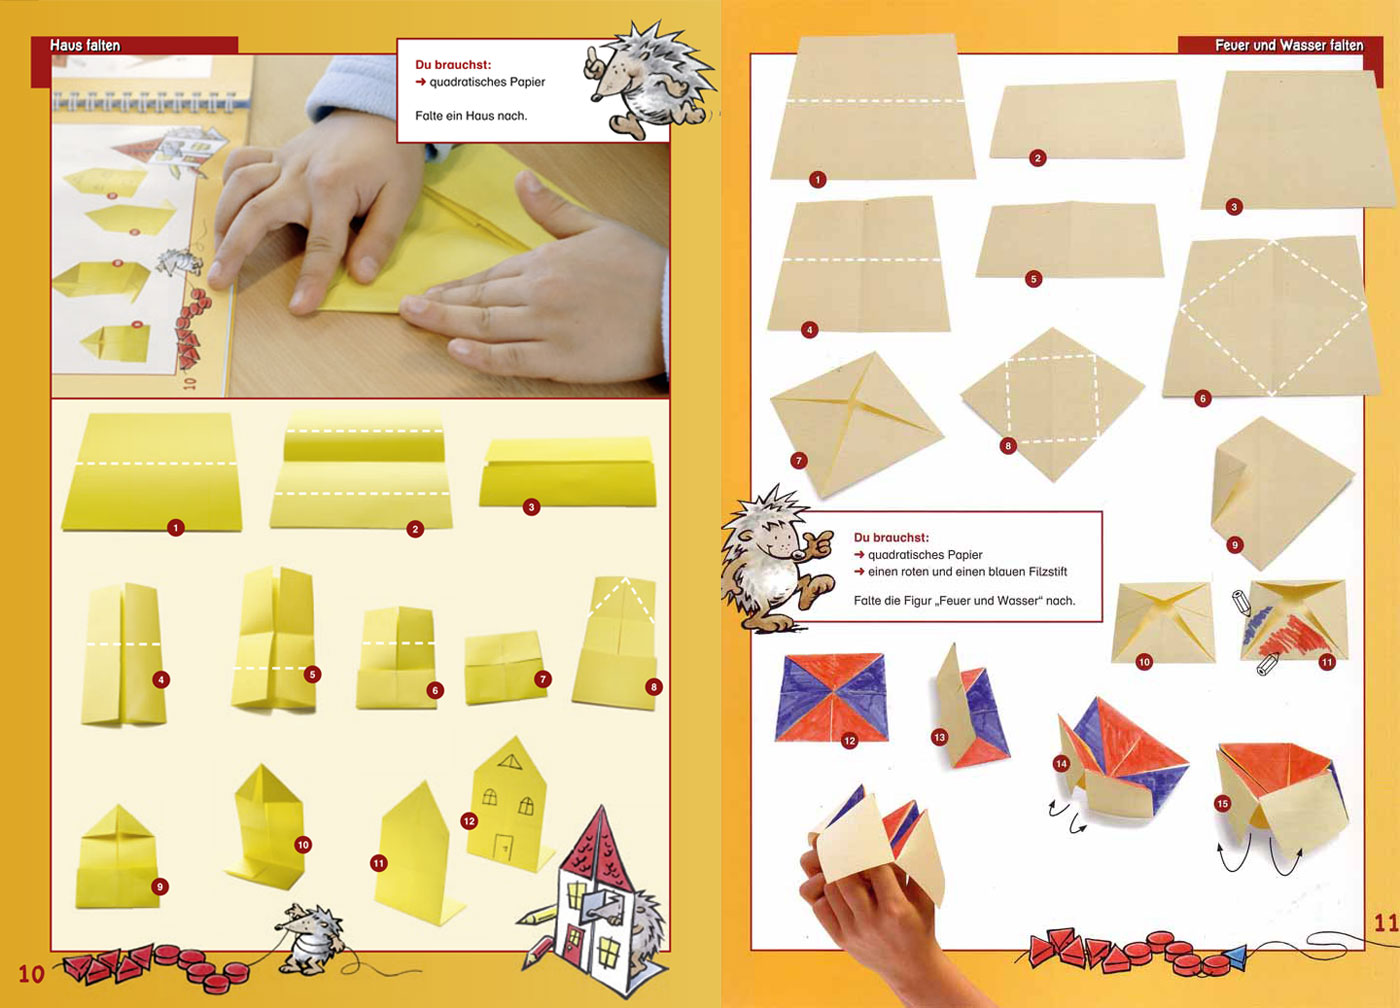 das kleine formenbuch f r 4 bis 7 j hrige kinder mathe 2000. Black Bedroom Furniture Sets. Home Design Ideas